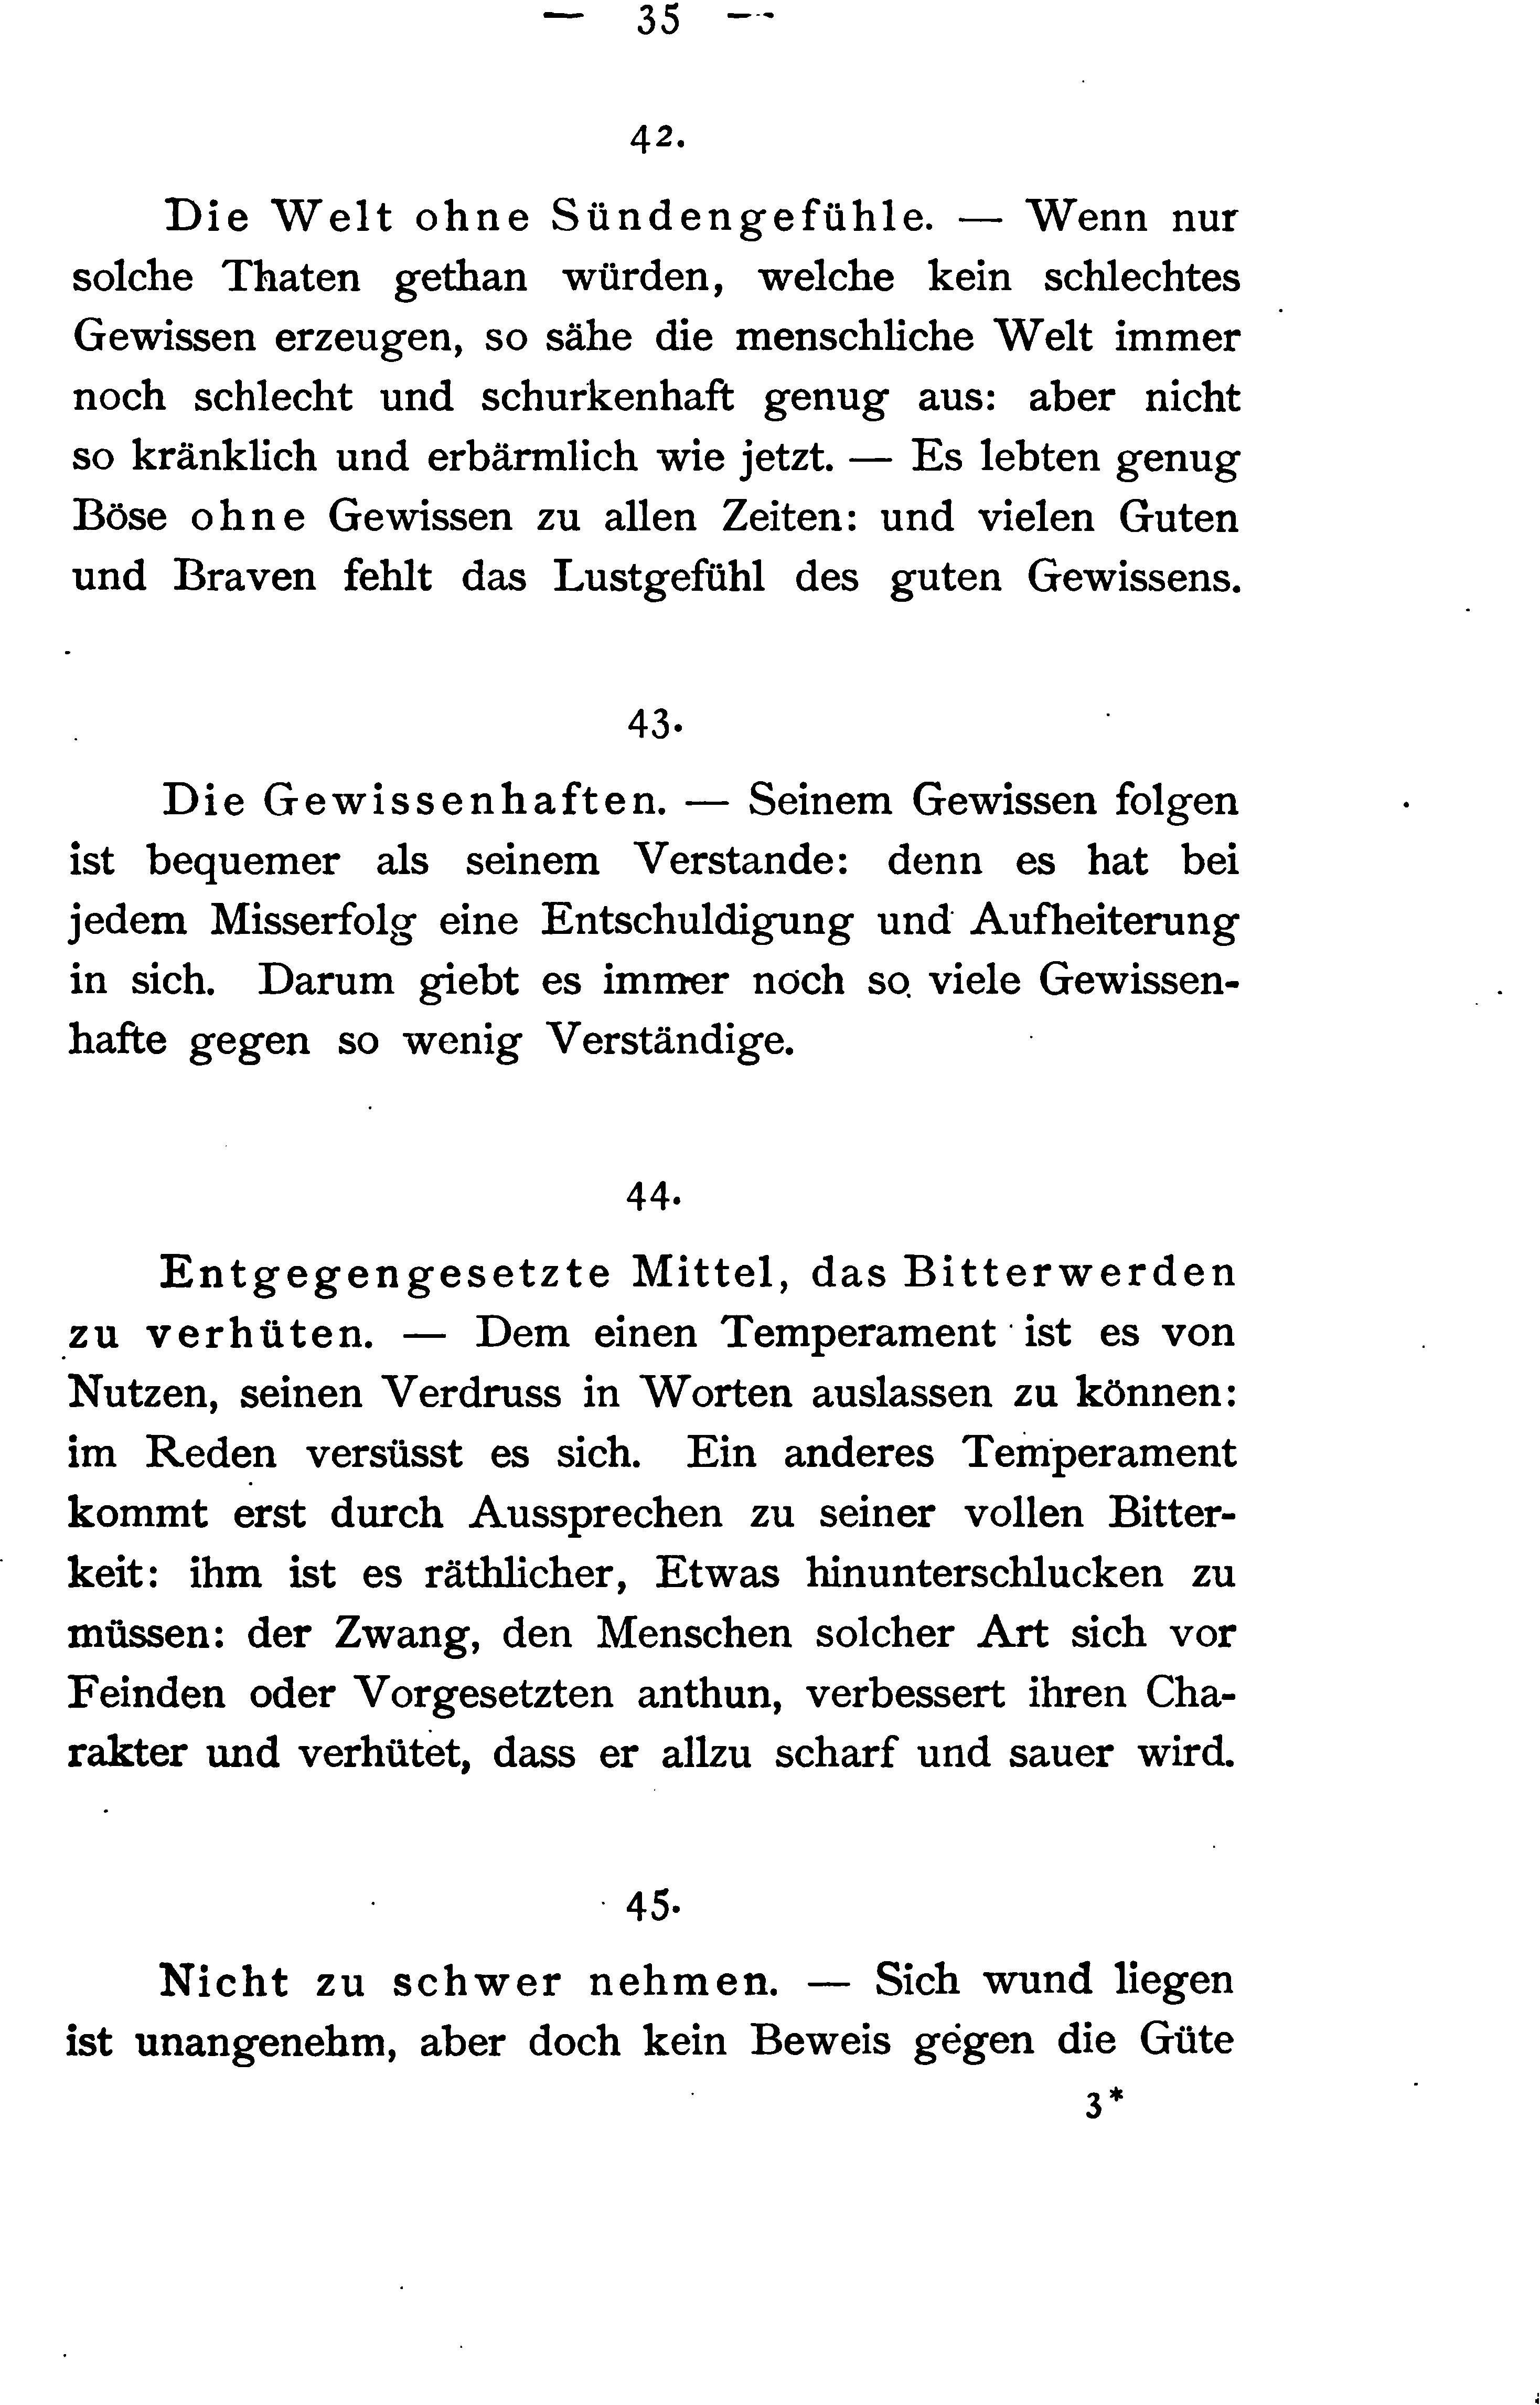 File:Nietzsche\'s Werke, III - 049.jpg - Wikimedia Commons